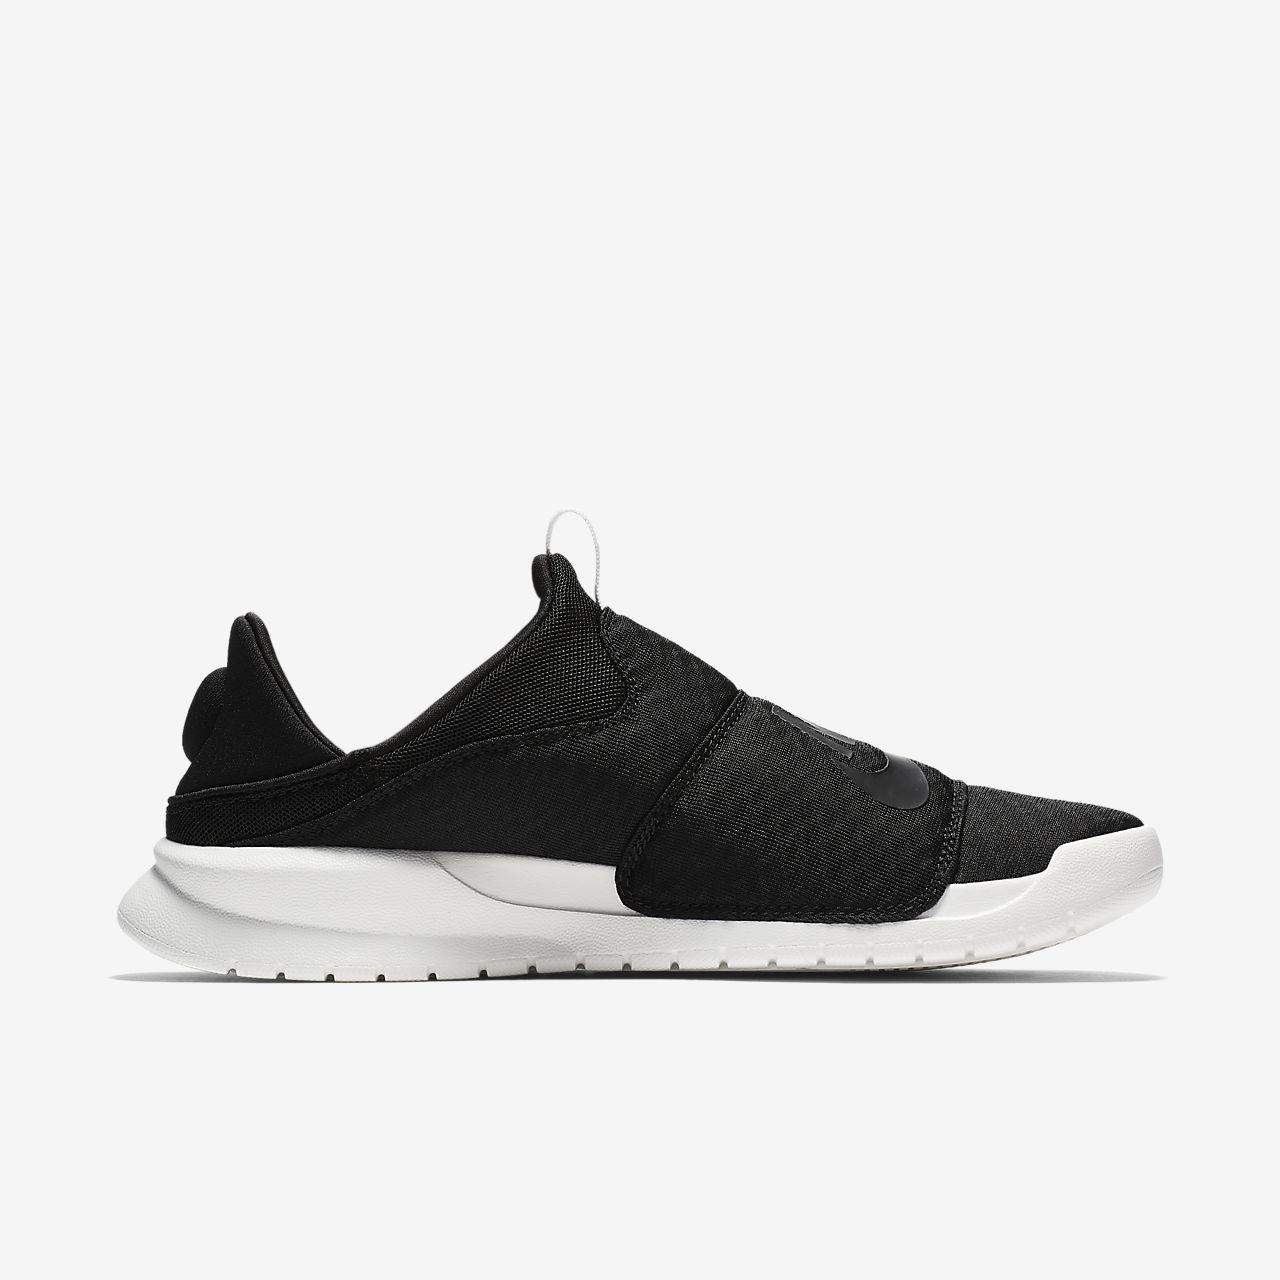 Modest Nike Benassi Slip Comfort Shoes Women's Shoes